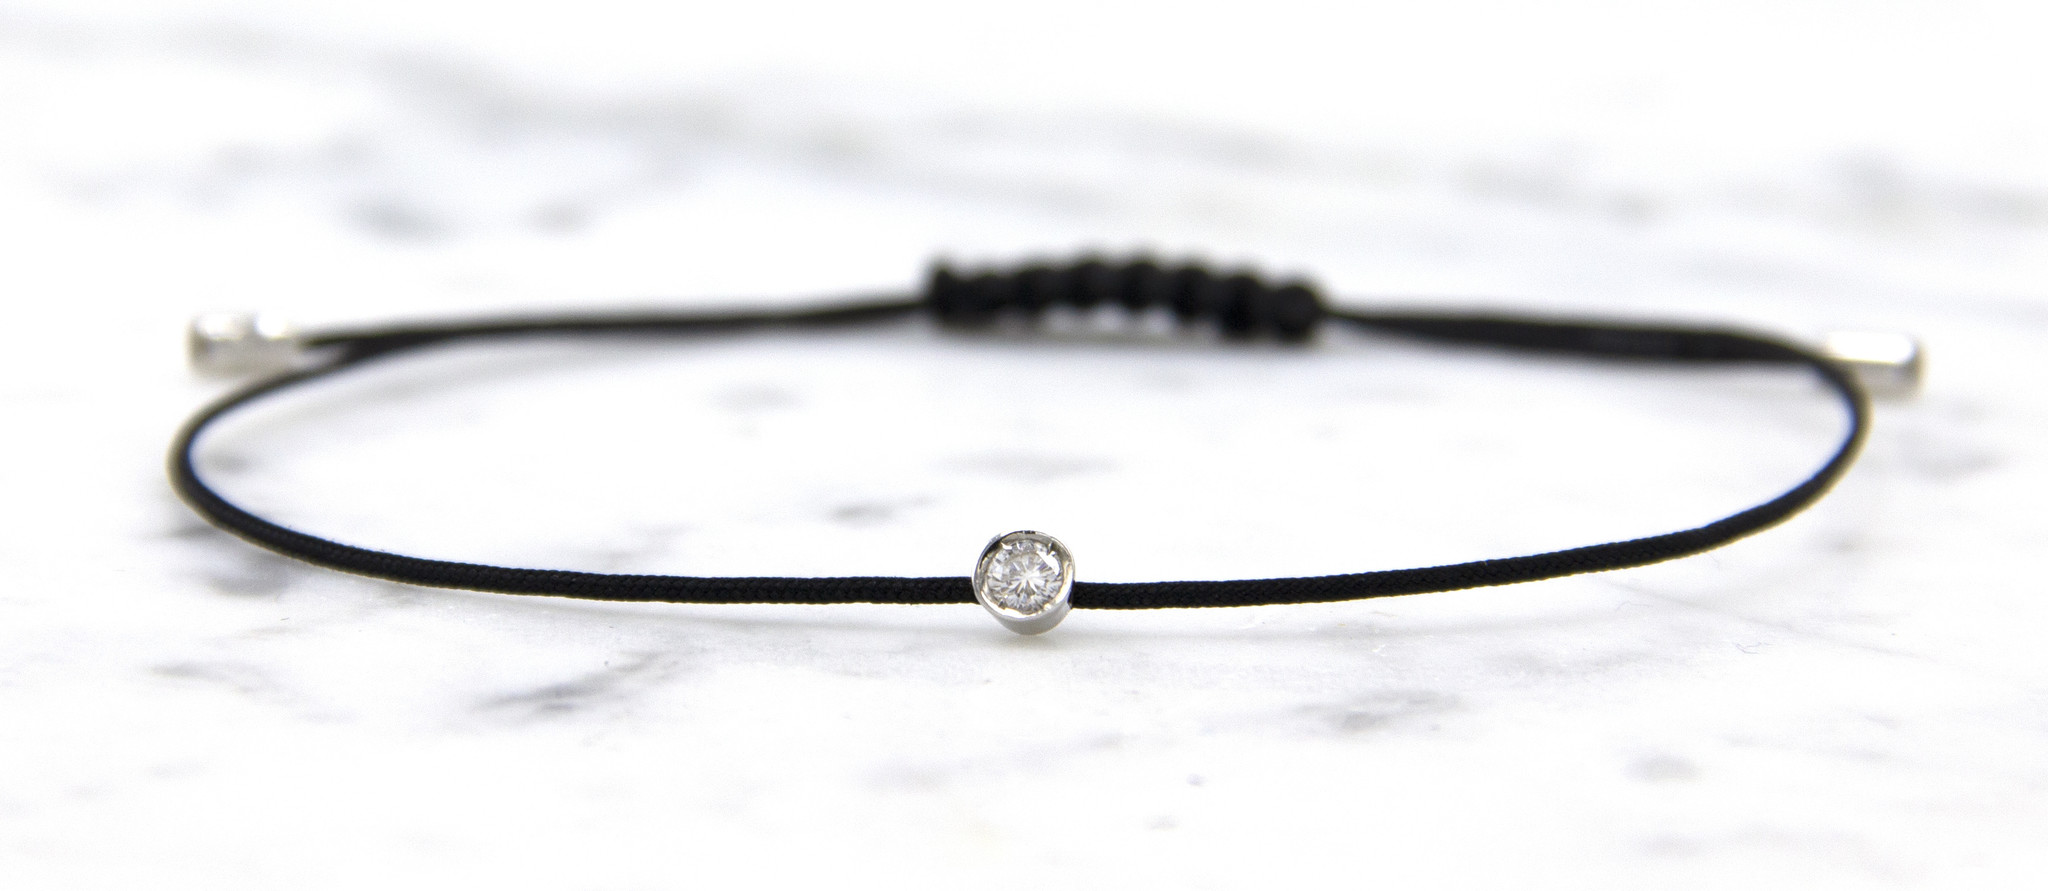 18 karaat witgouden armband met diamant - Hutjens Rope  -  Solitair-2